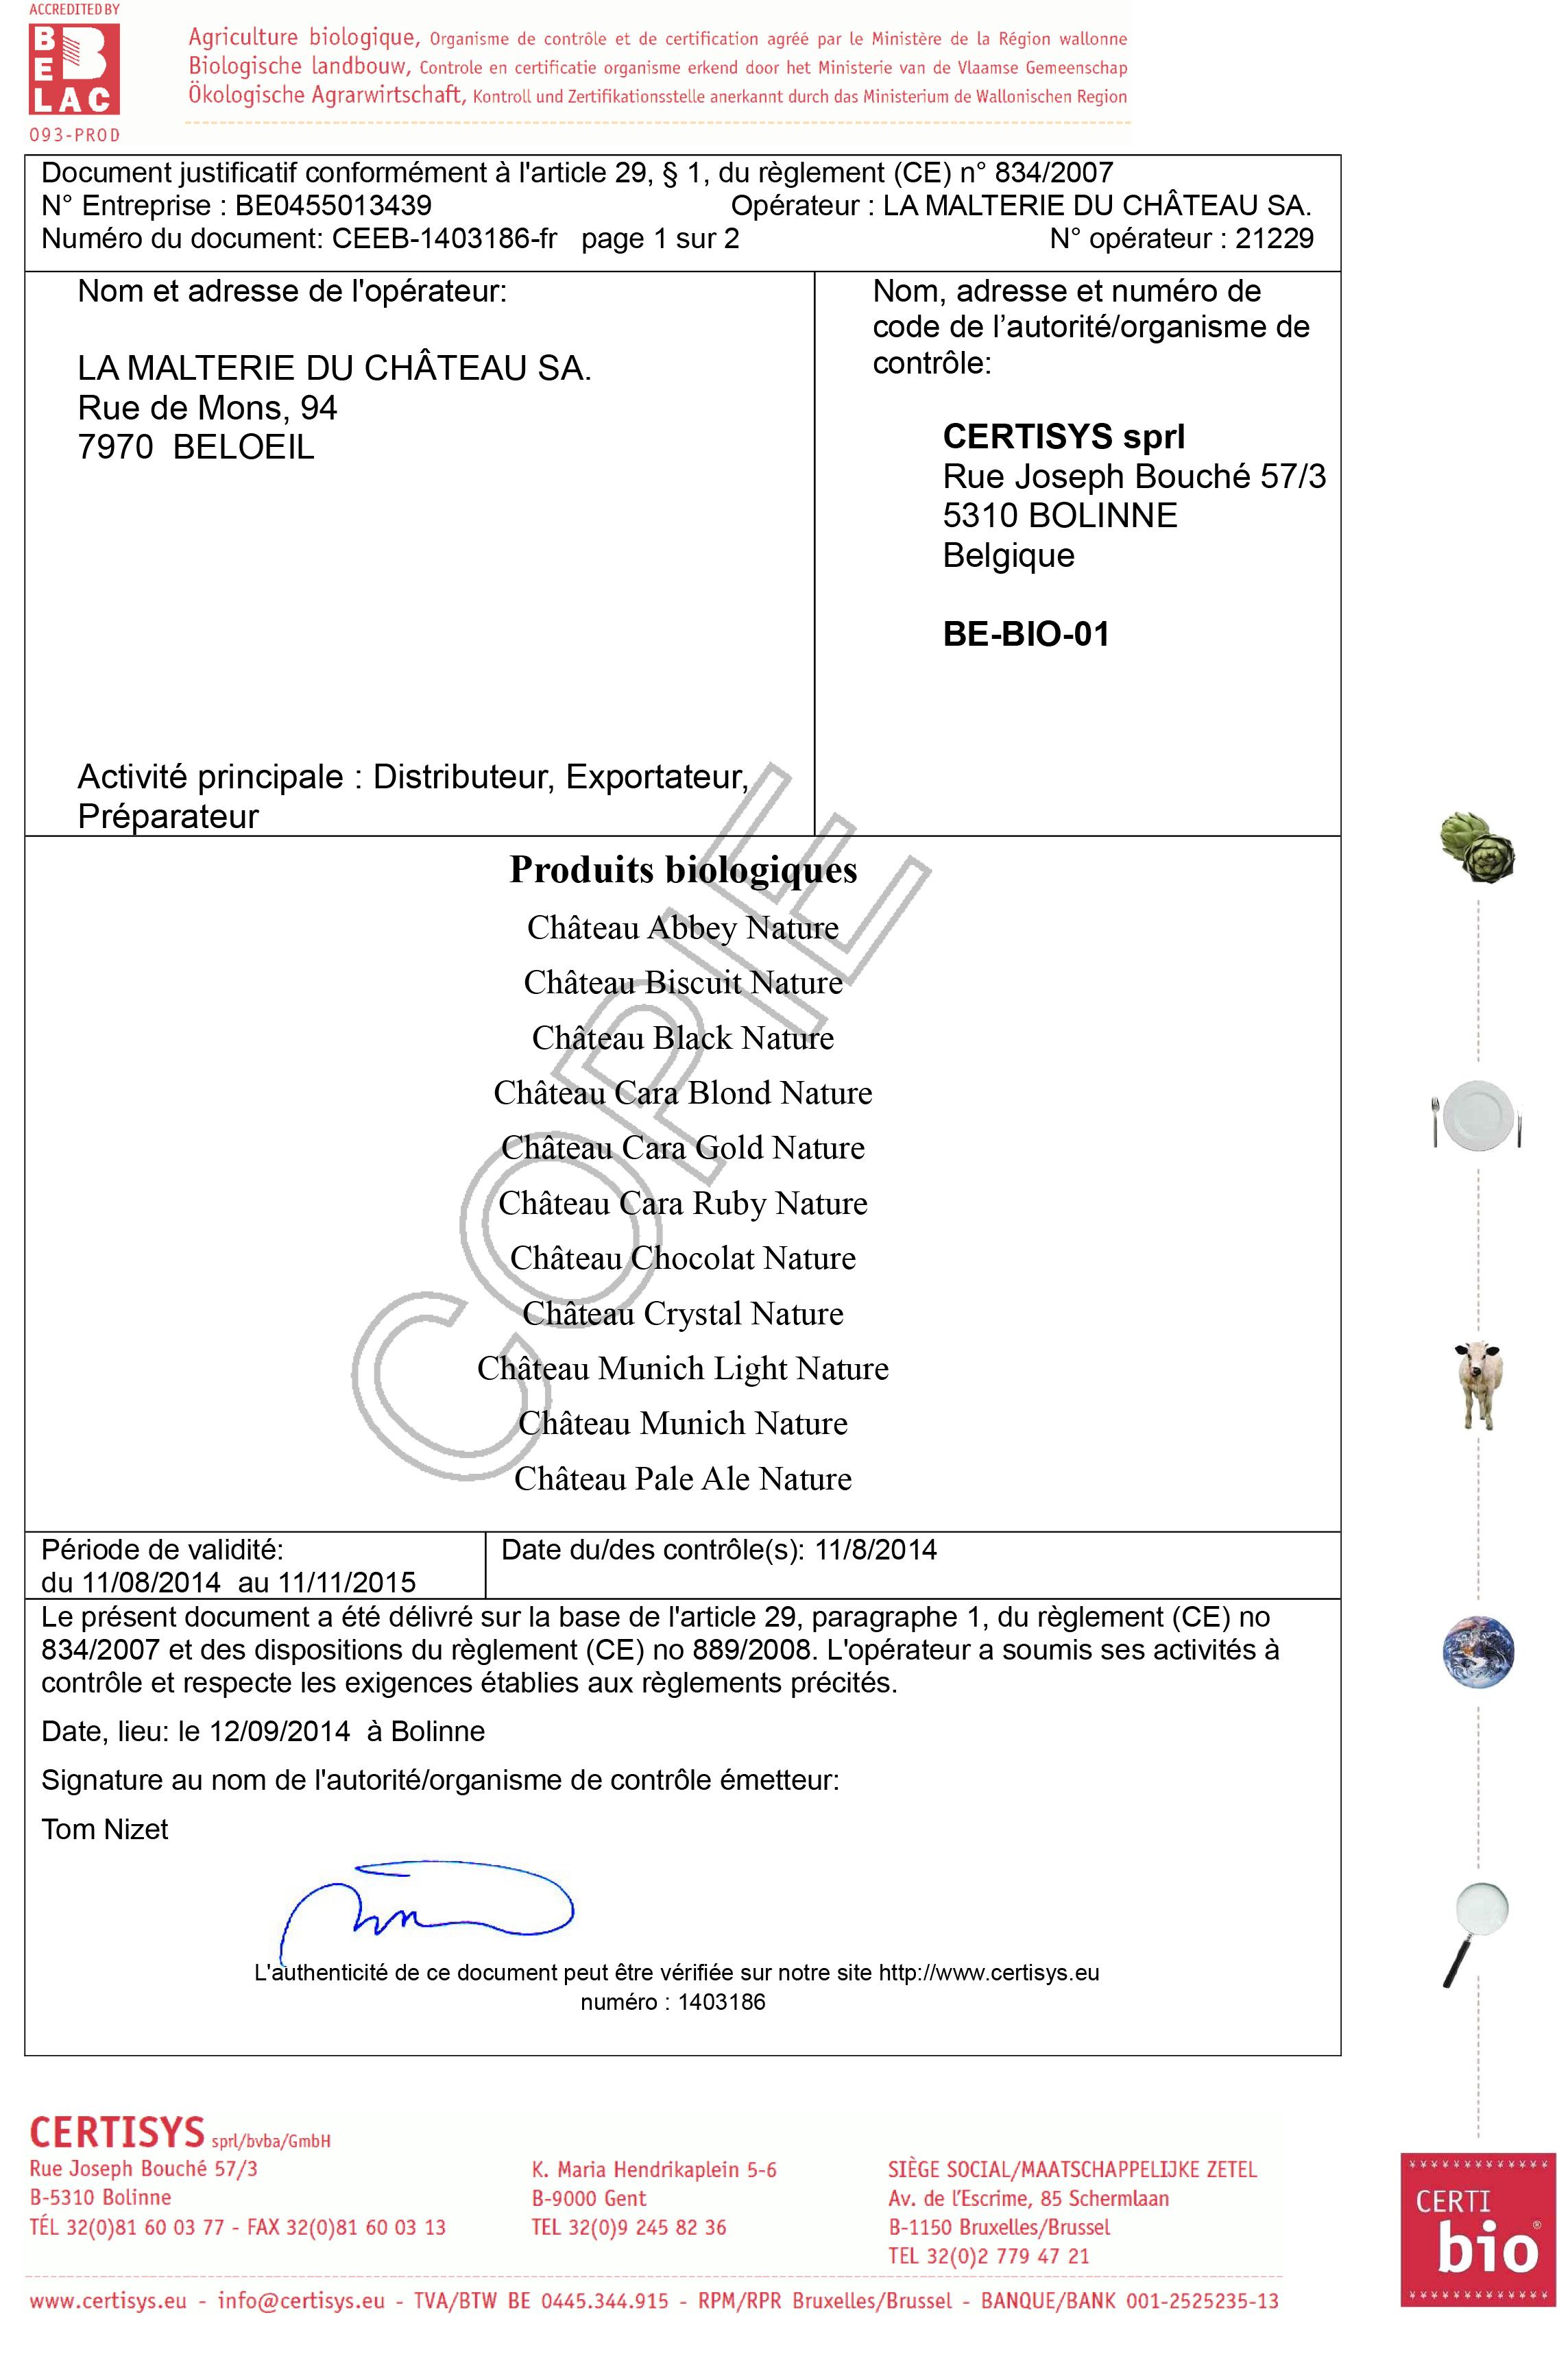 CM_Certificate_Bio_11_08_2014_11_11_2015_fr.jpg